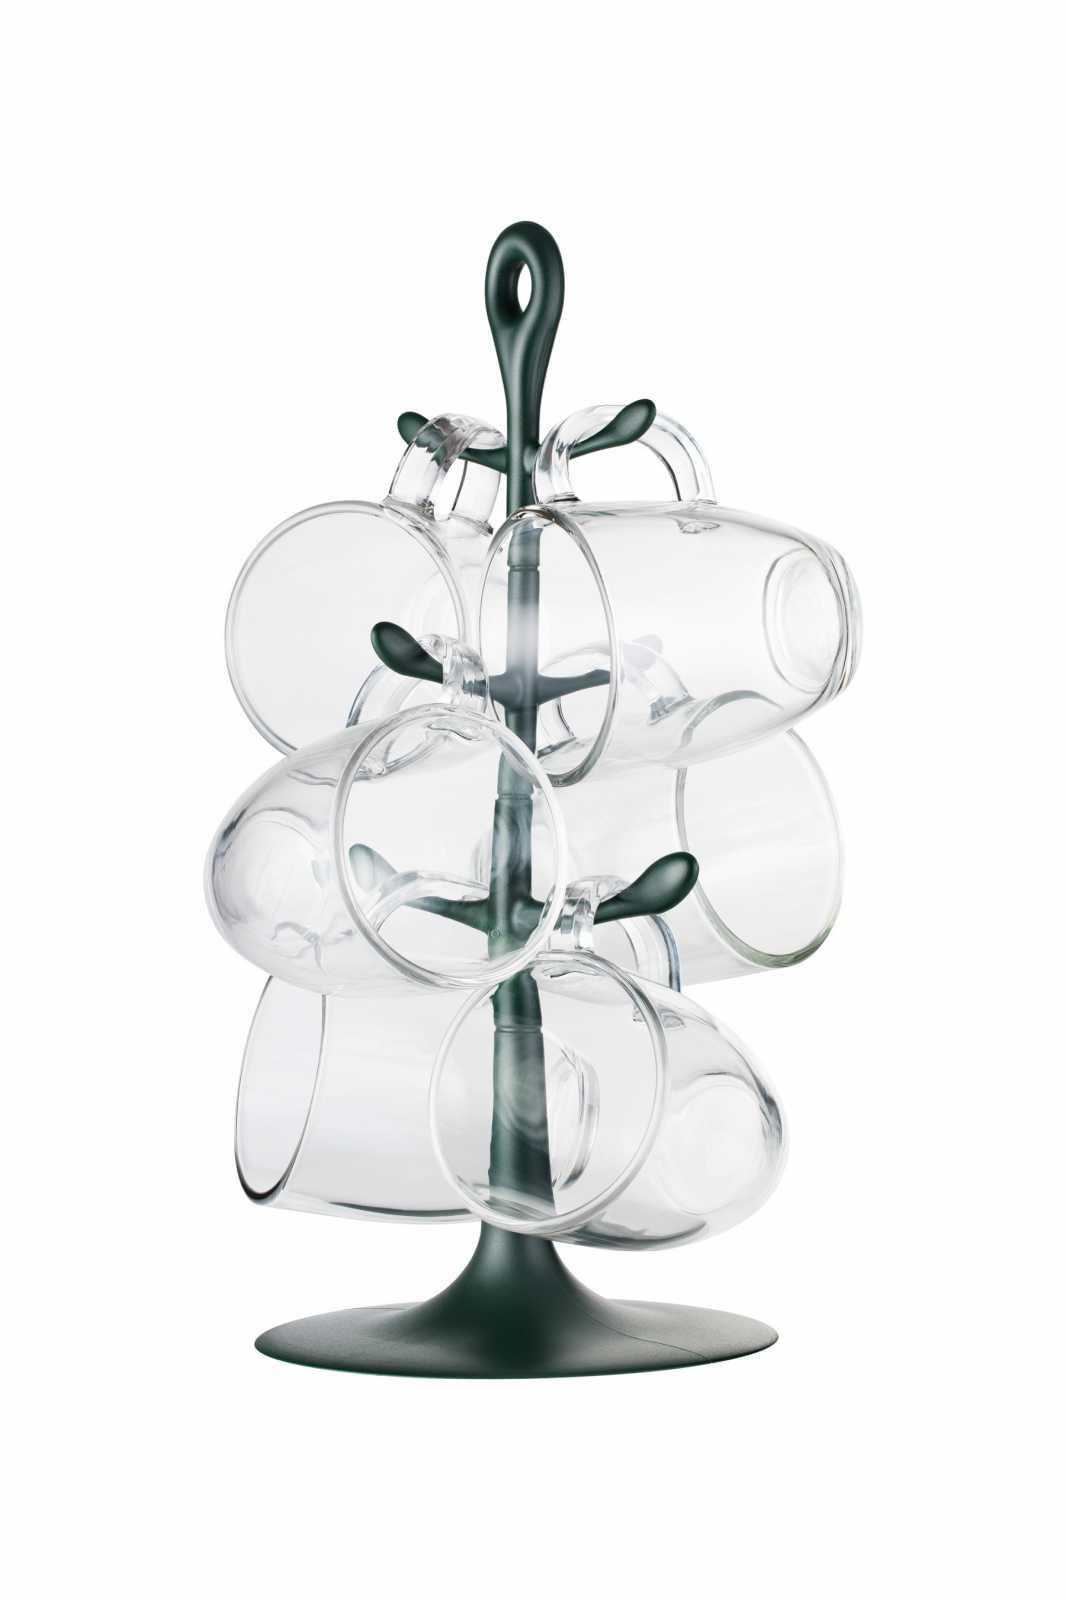 Онлайн каталог PROMENU: Набор кружек на подставке Bodum, 6 шт, темно-зеленый Bodum K2110-946-Y17